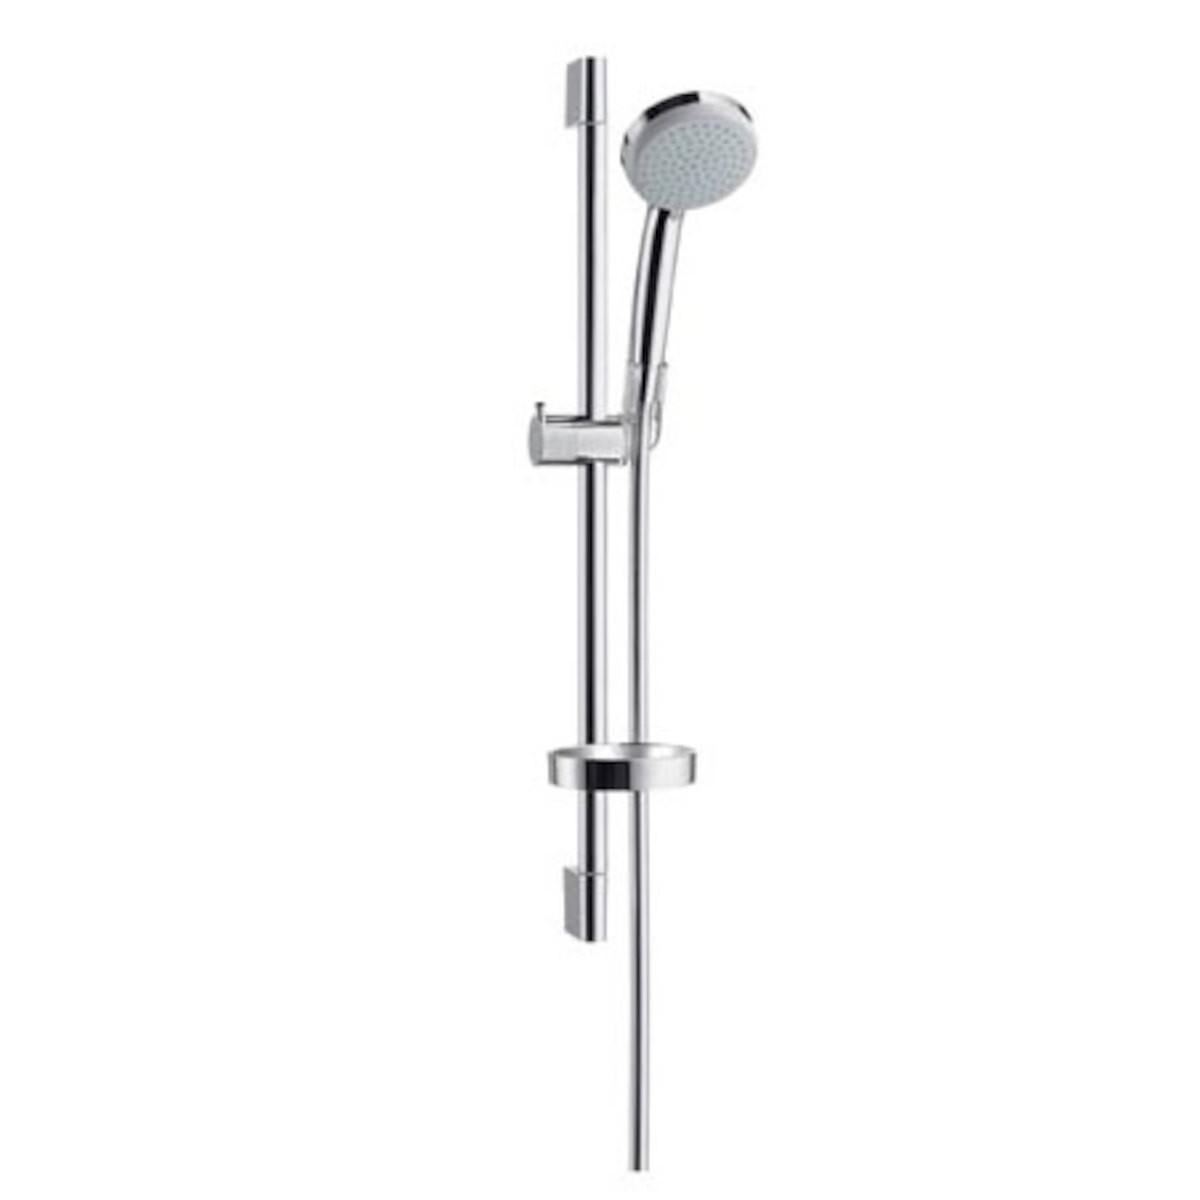 Sprchový set Hansgrohe Croma 100 s mydlovničkou chróm 27772000